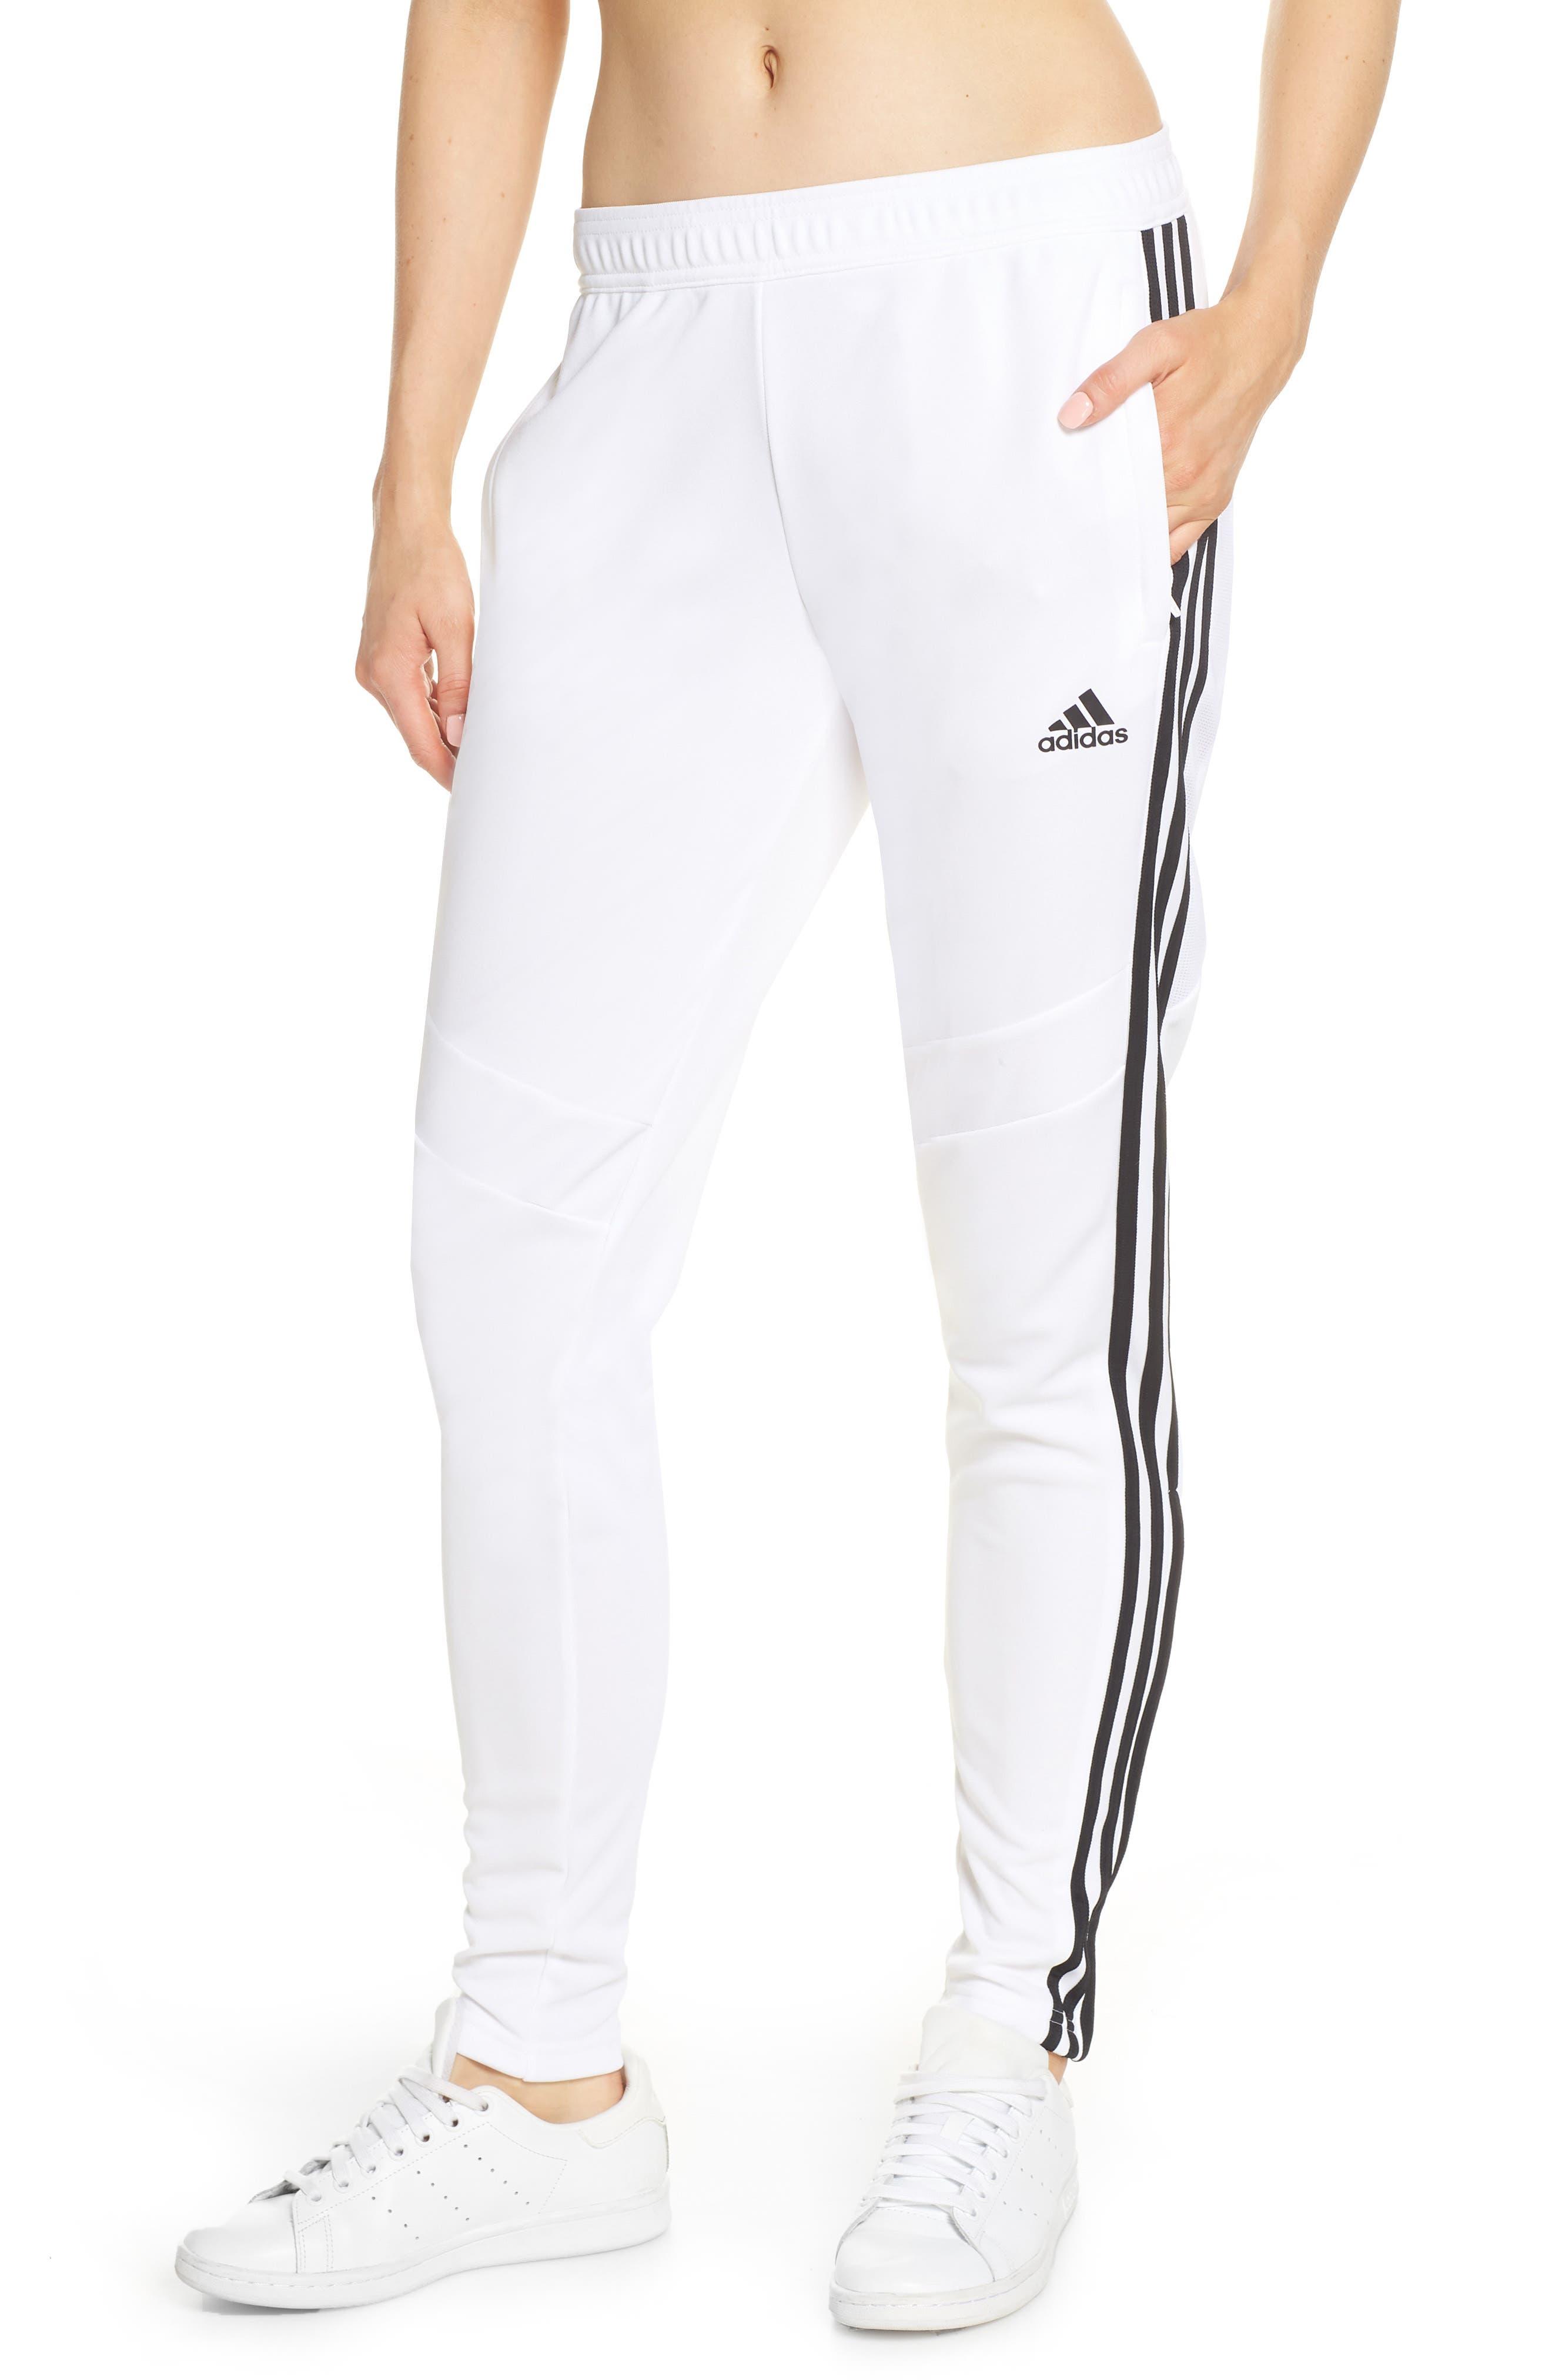 ADIDAS, Tiro 19 Training Pants, Main thumbnail 1, color, WHITE/ BLACK